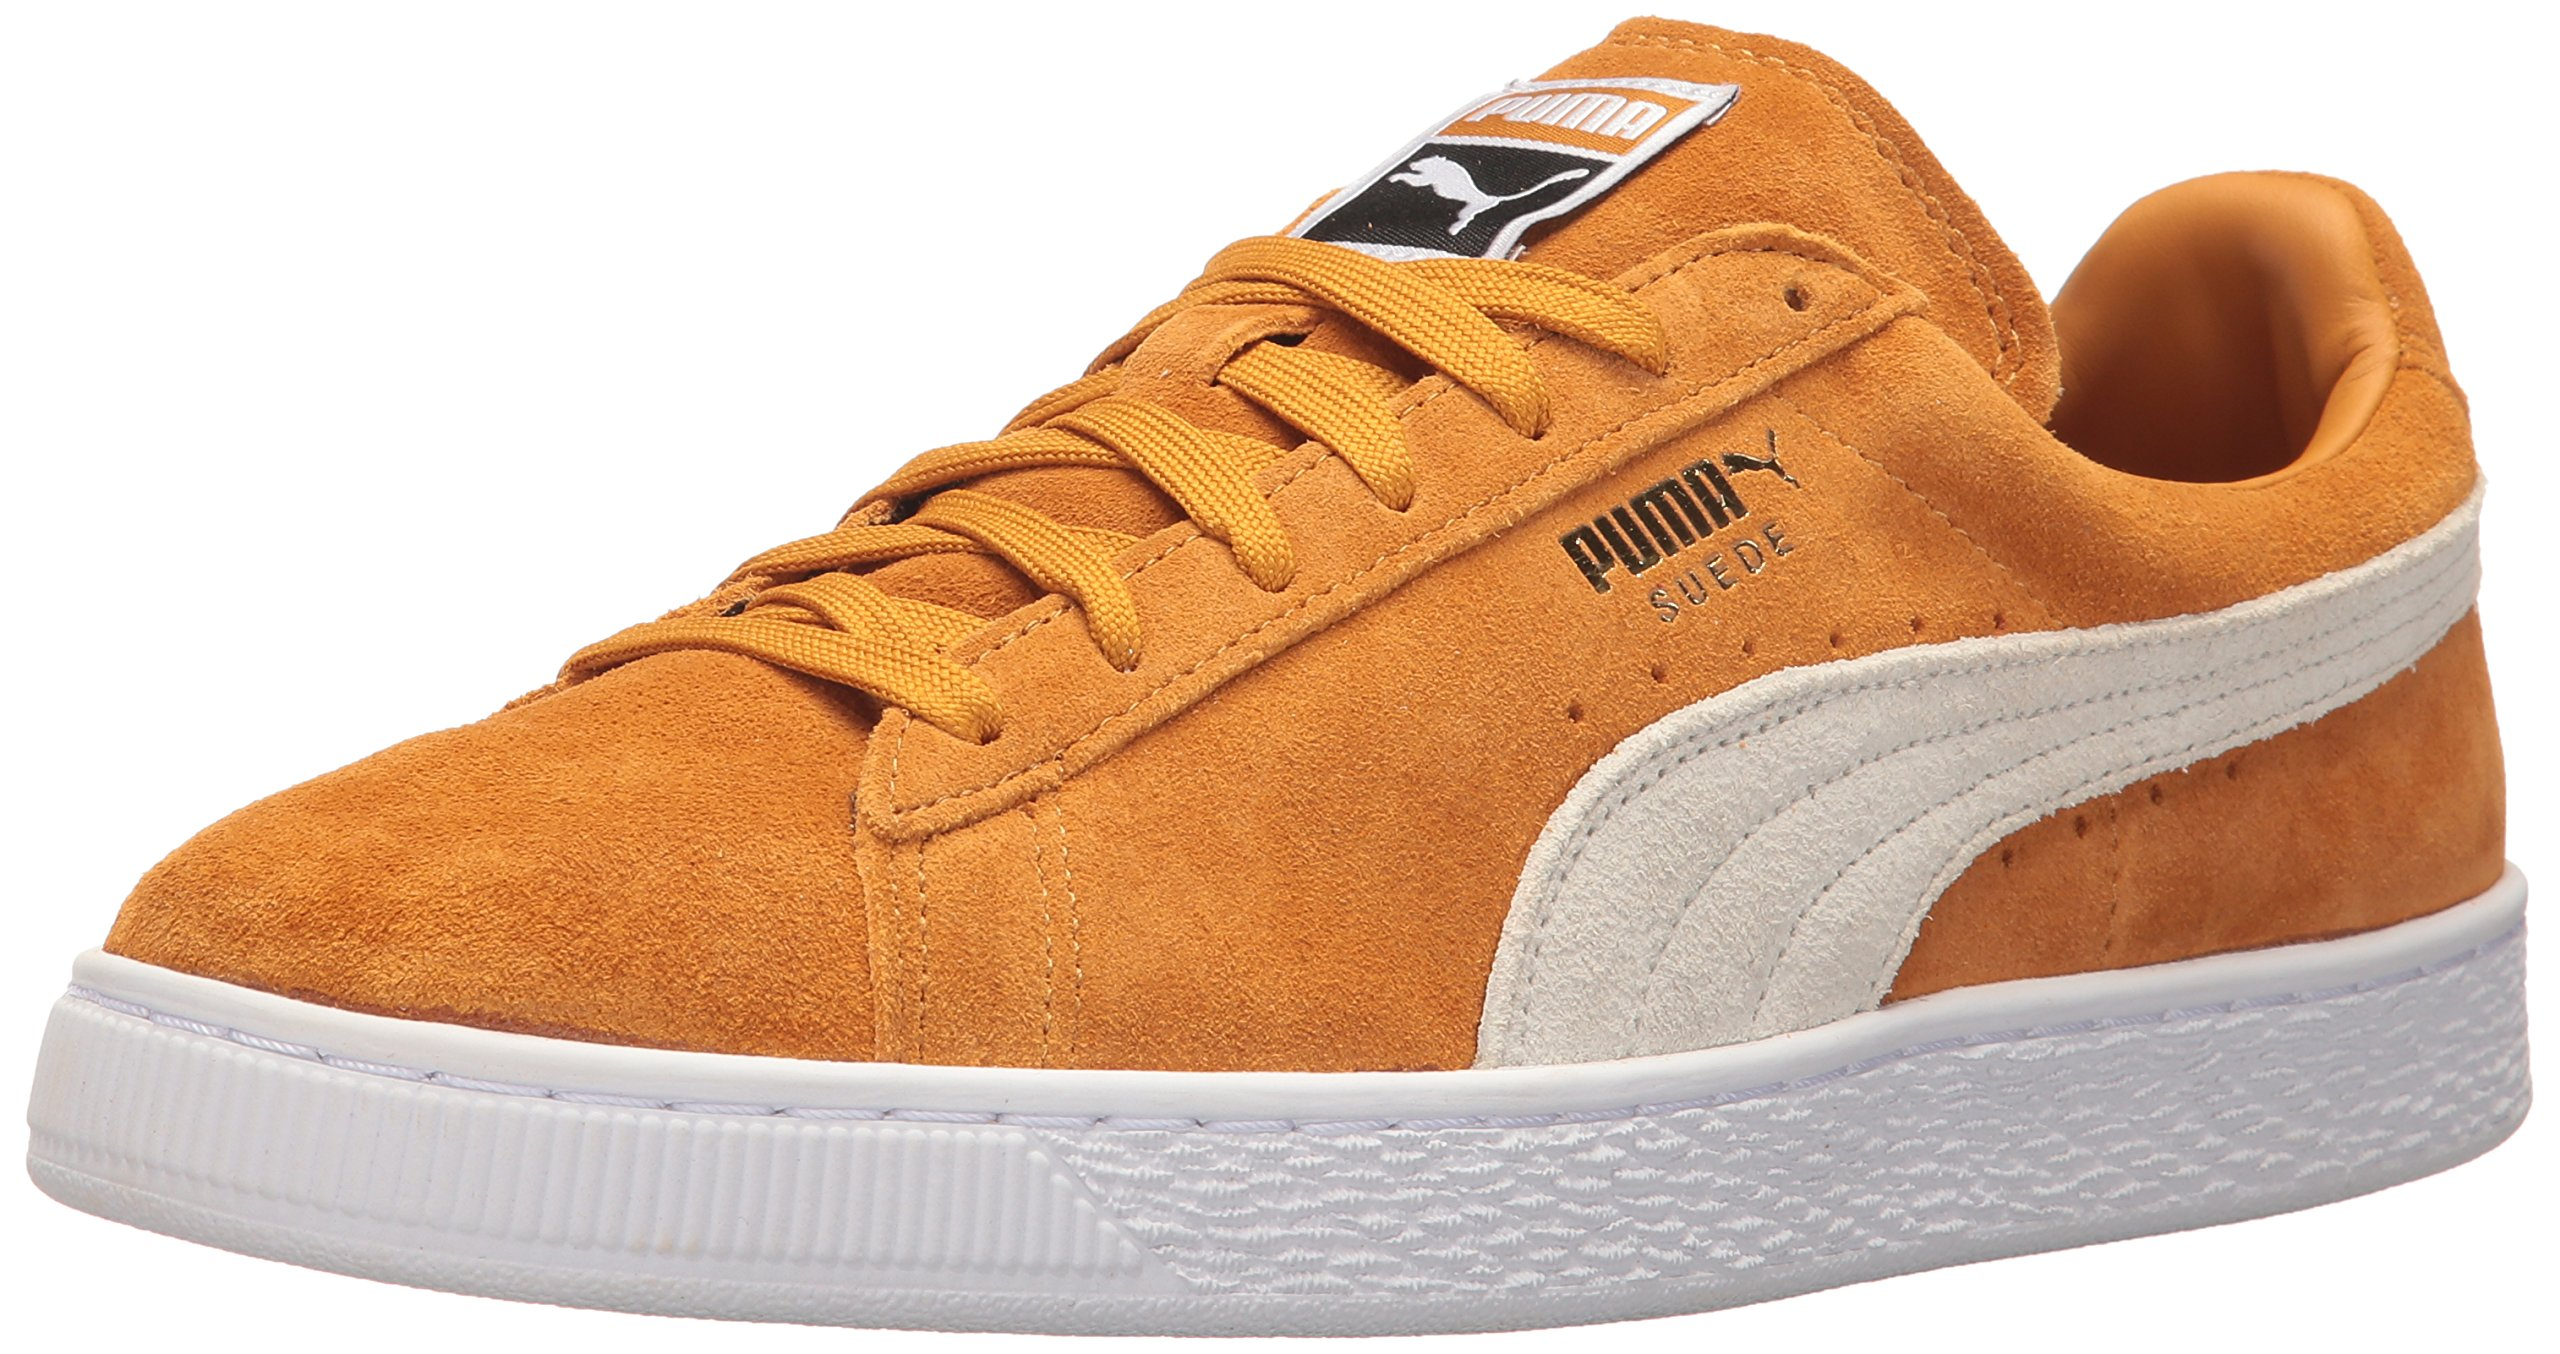 buy popular 2d2ec 9d52d PUMA Men's Suede Classic Fashion Sneaker, Inca Gold-puma White, 8 D(M) US